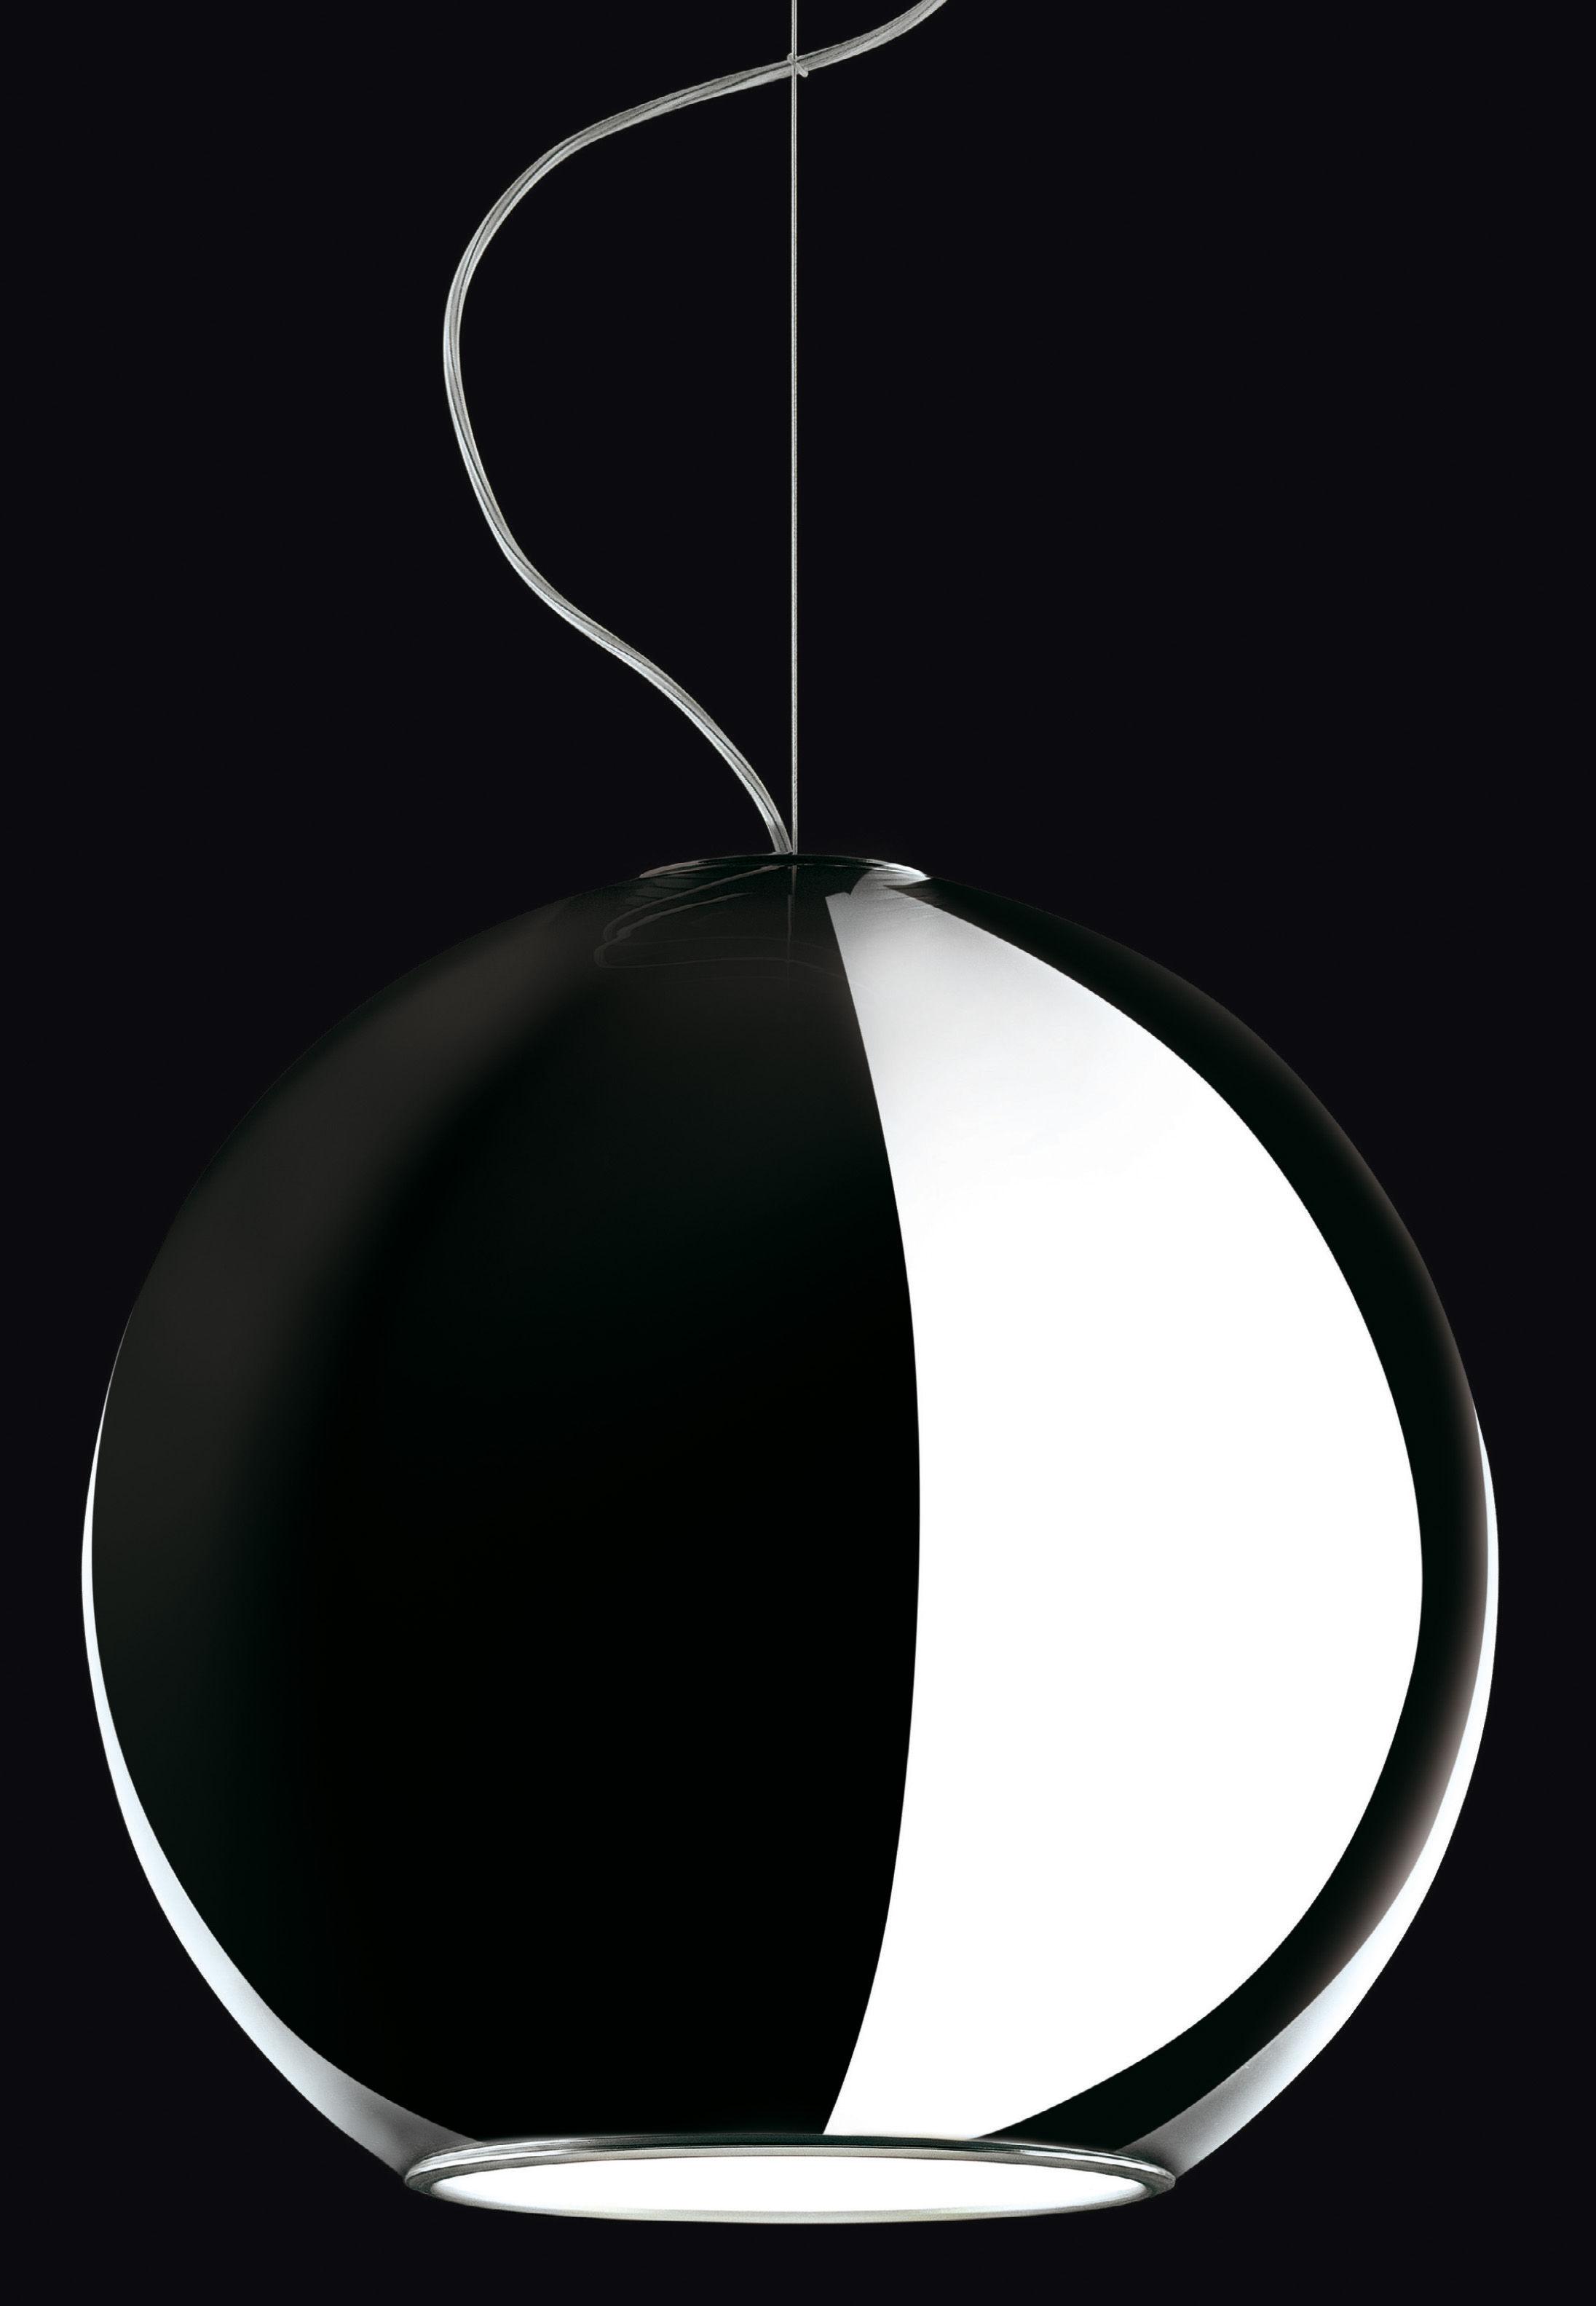 Globo di luce pendant diffuser l 30 x h 29 cm by fontana arte aloadofball Gallery